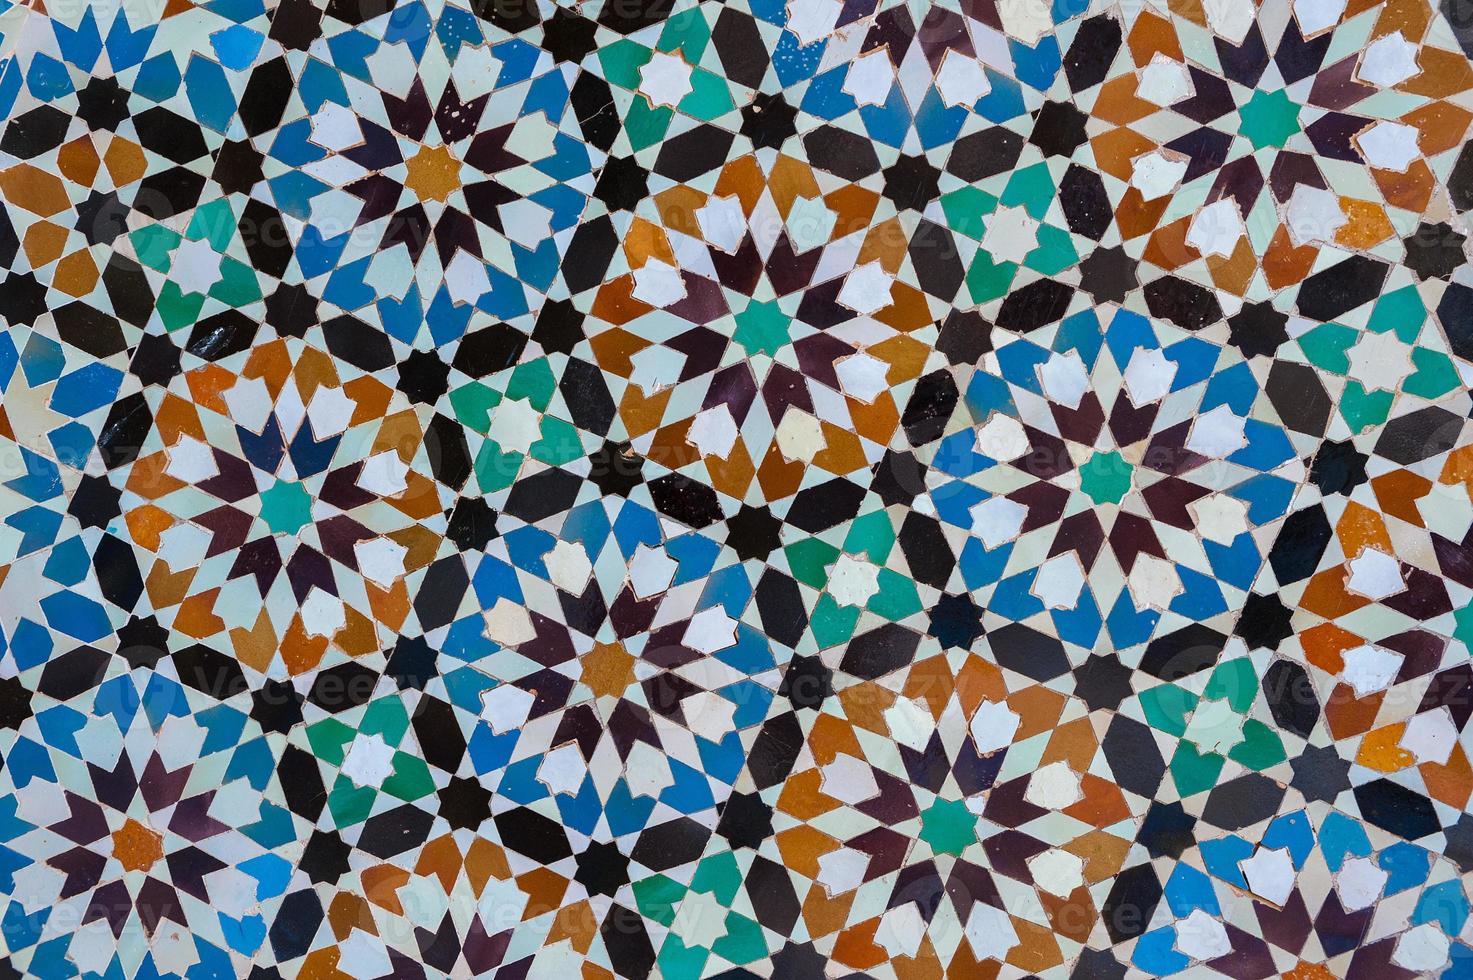 moroccan vintage tile background photo